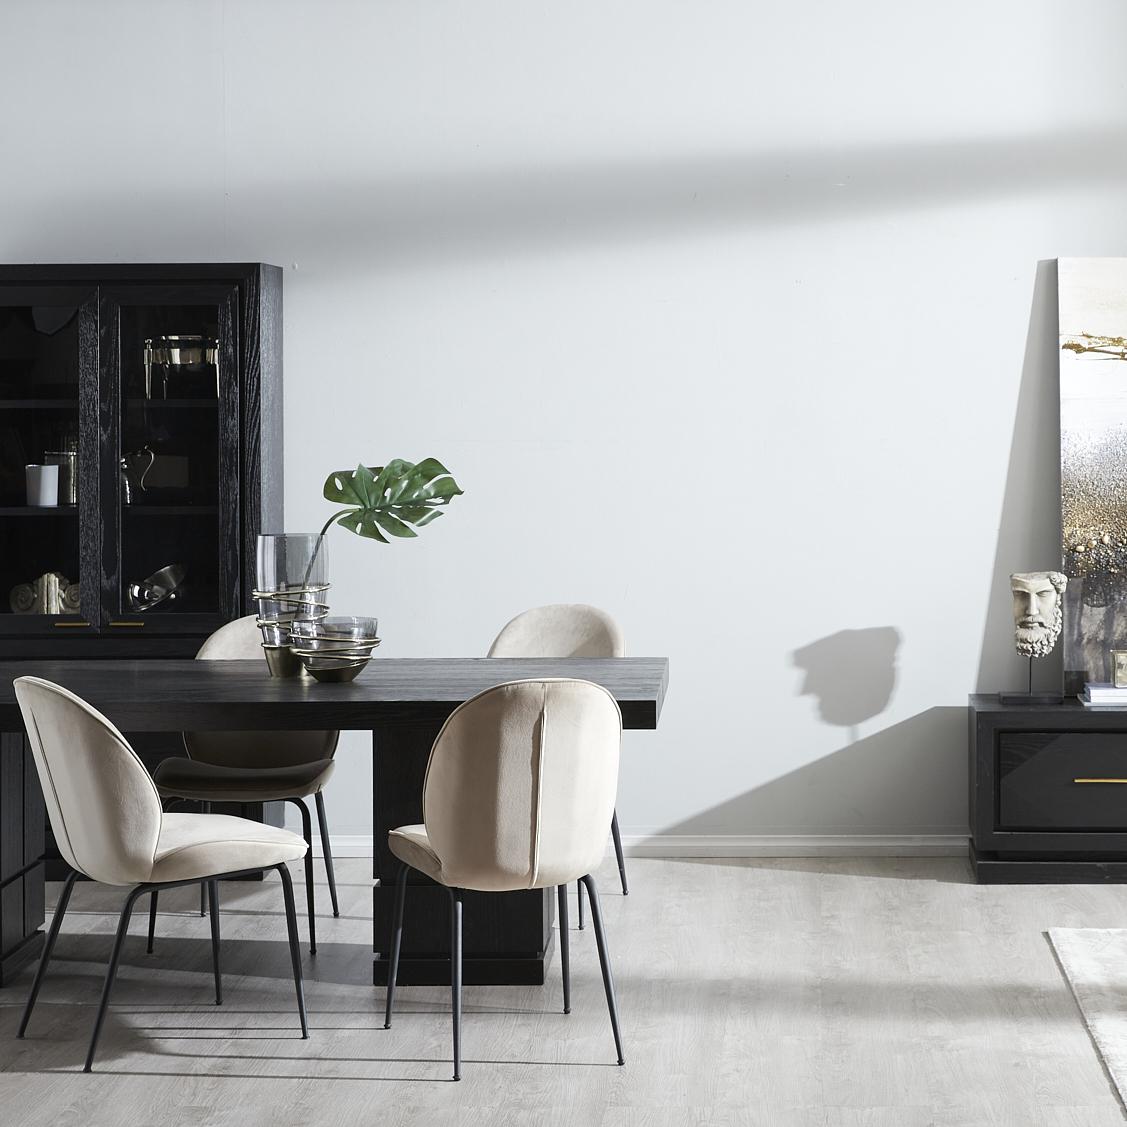 Portofino dining table